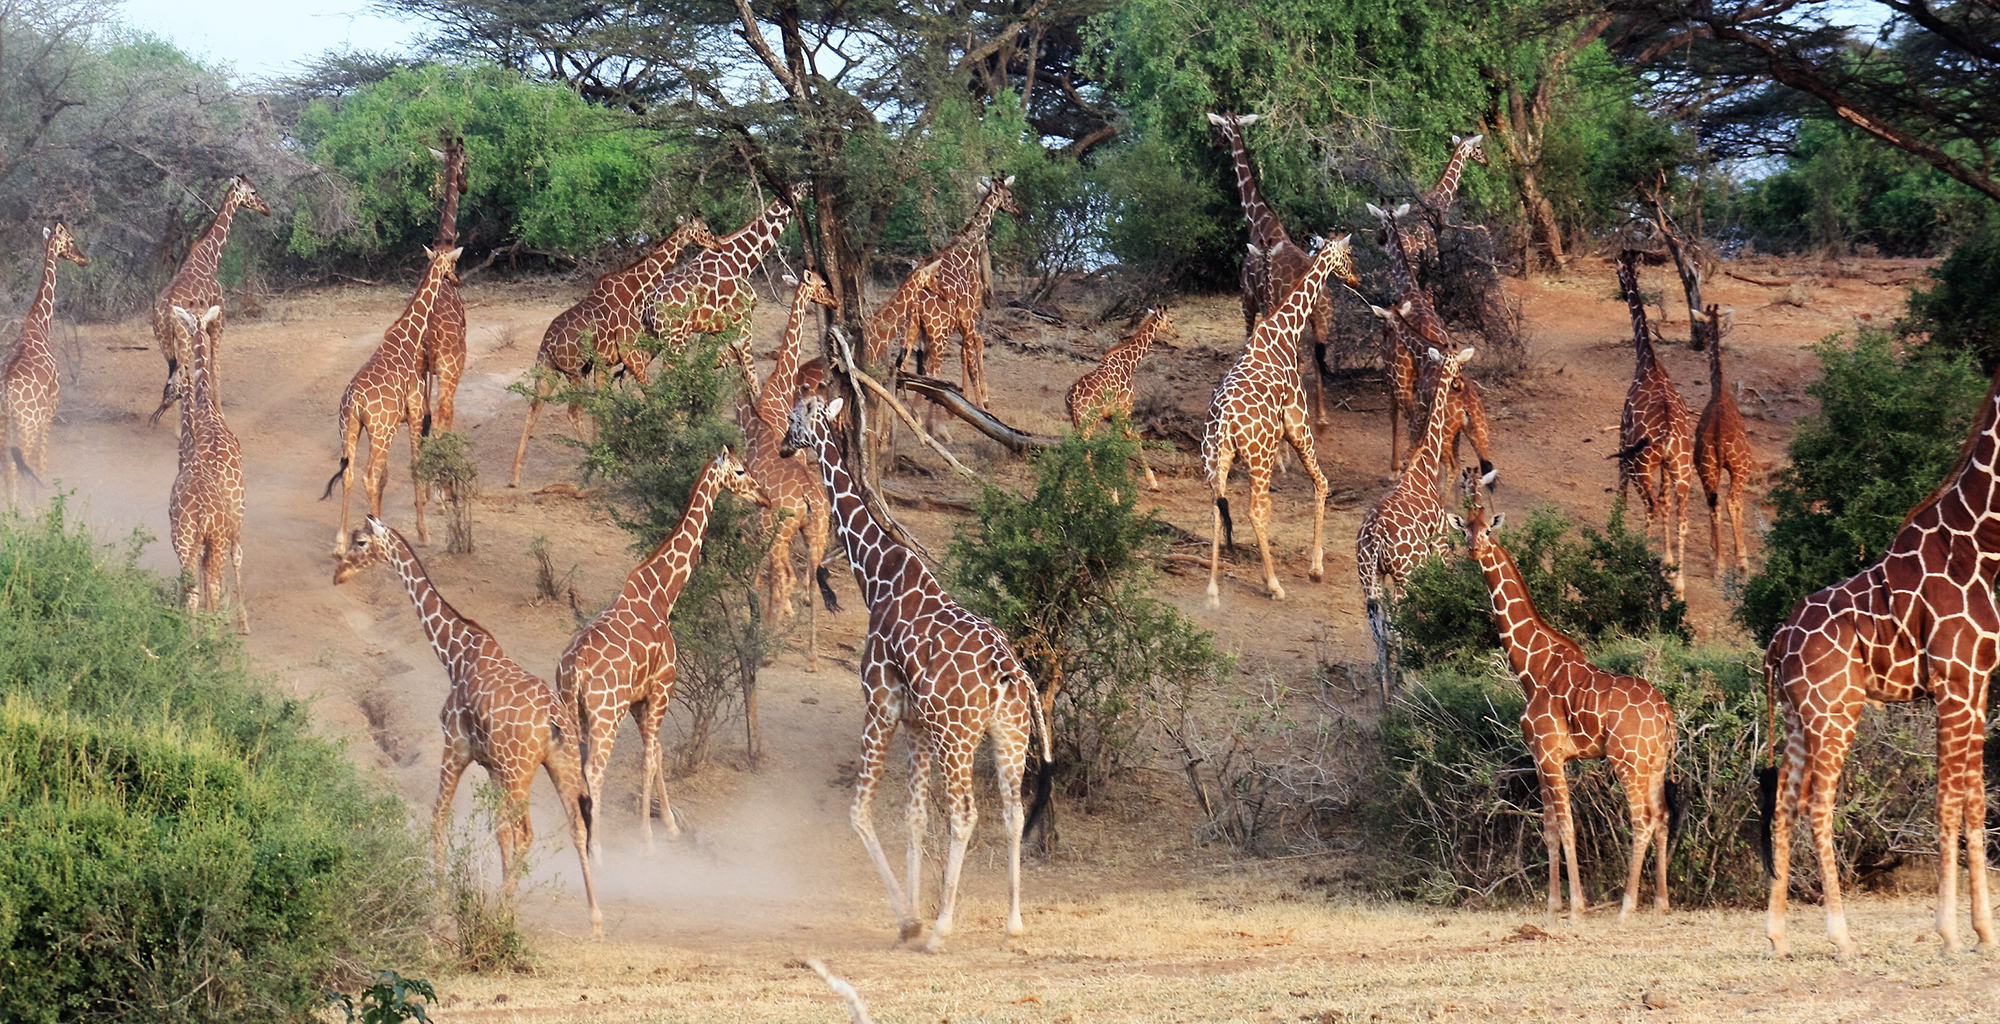 Kenya-Il-Ngwesi-Giraffe